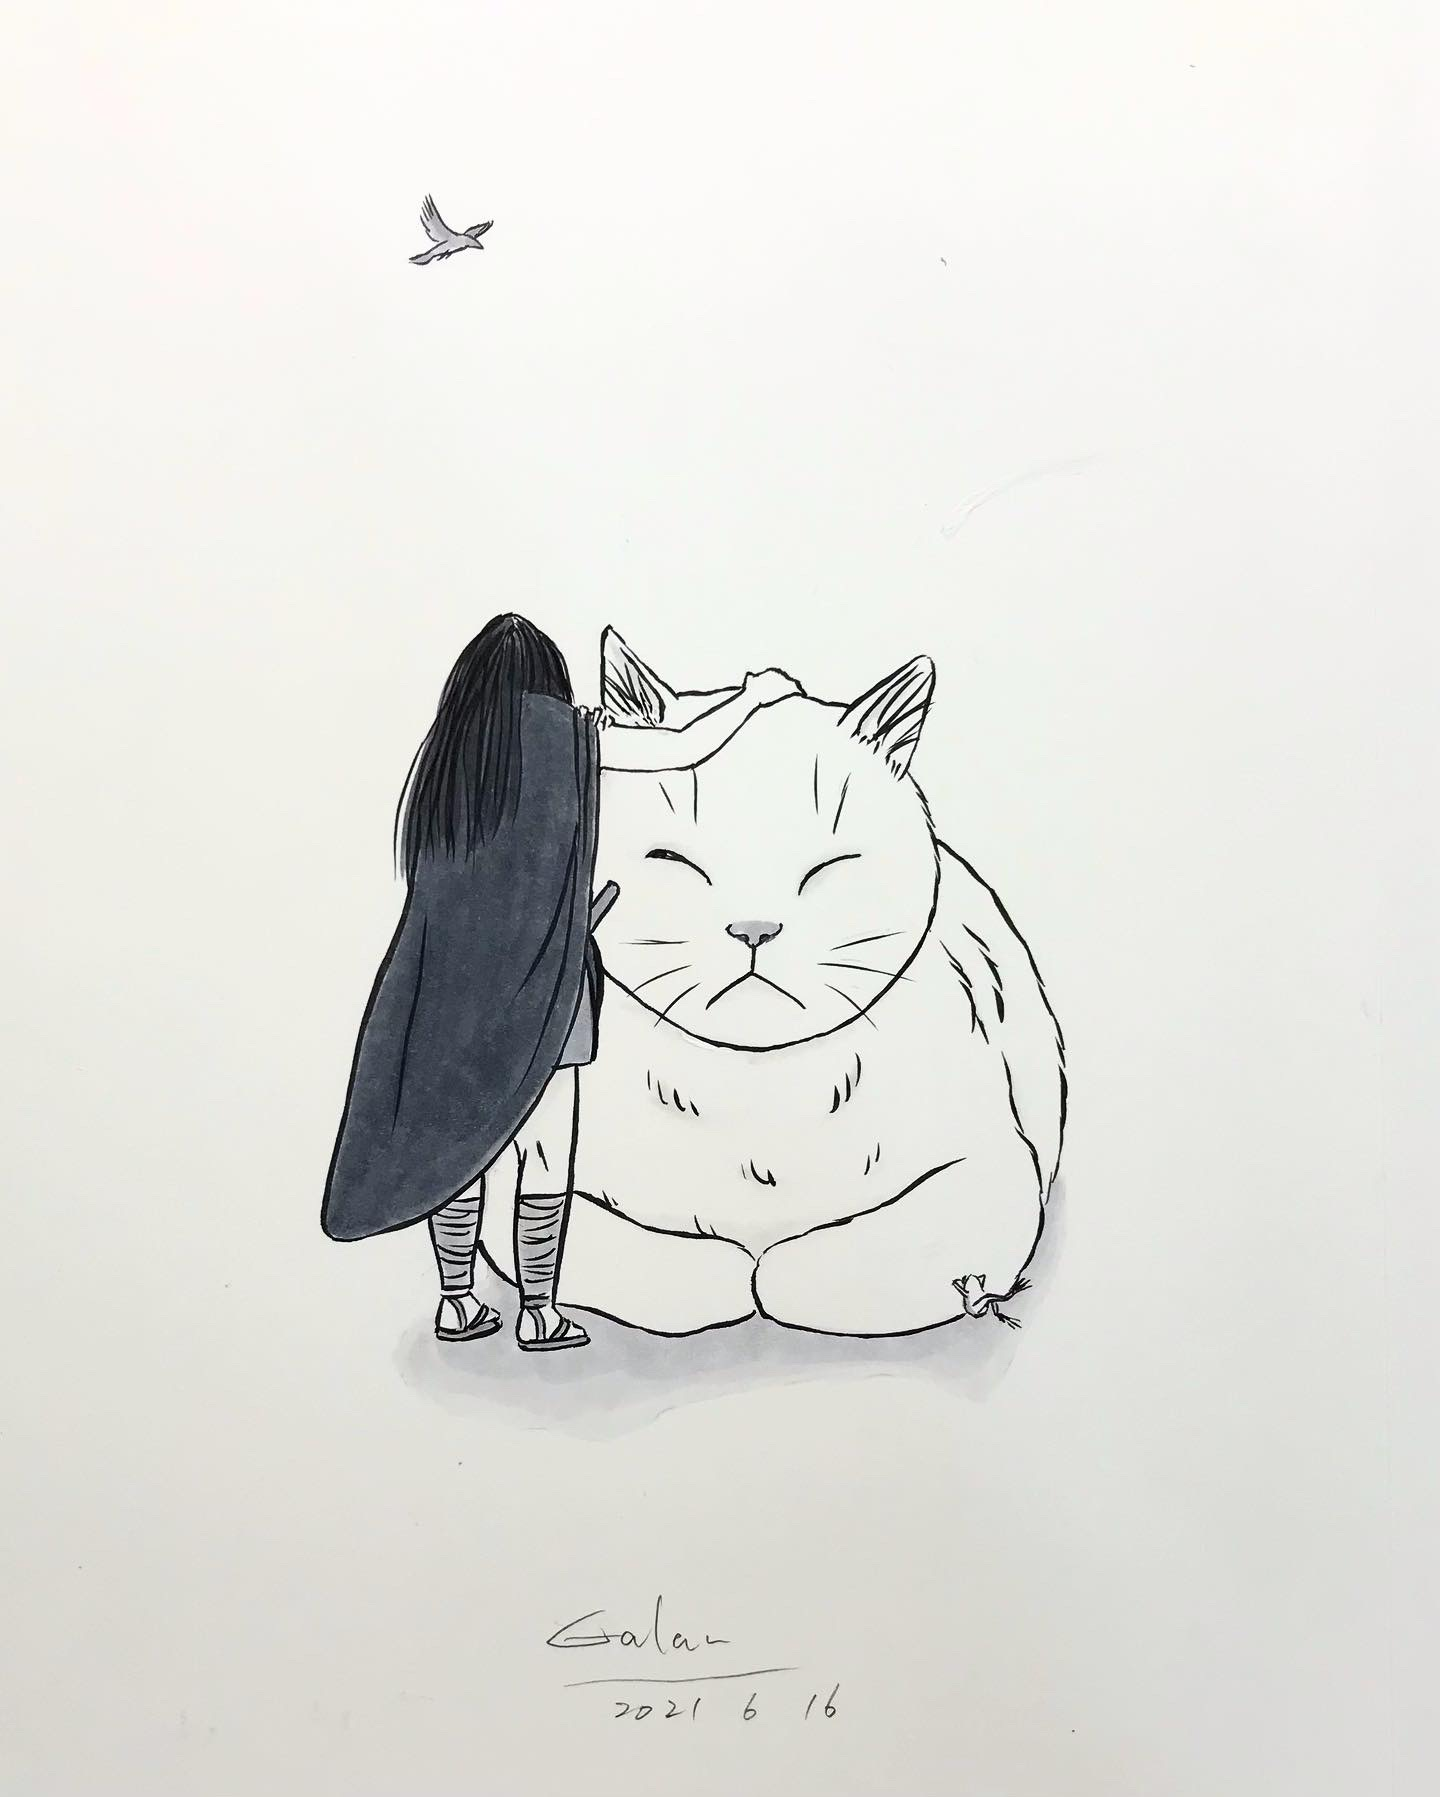 猫カエル小鳥 NEKOKAERUKOTORI